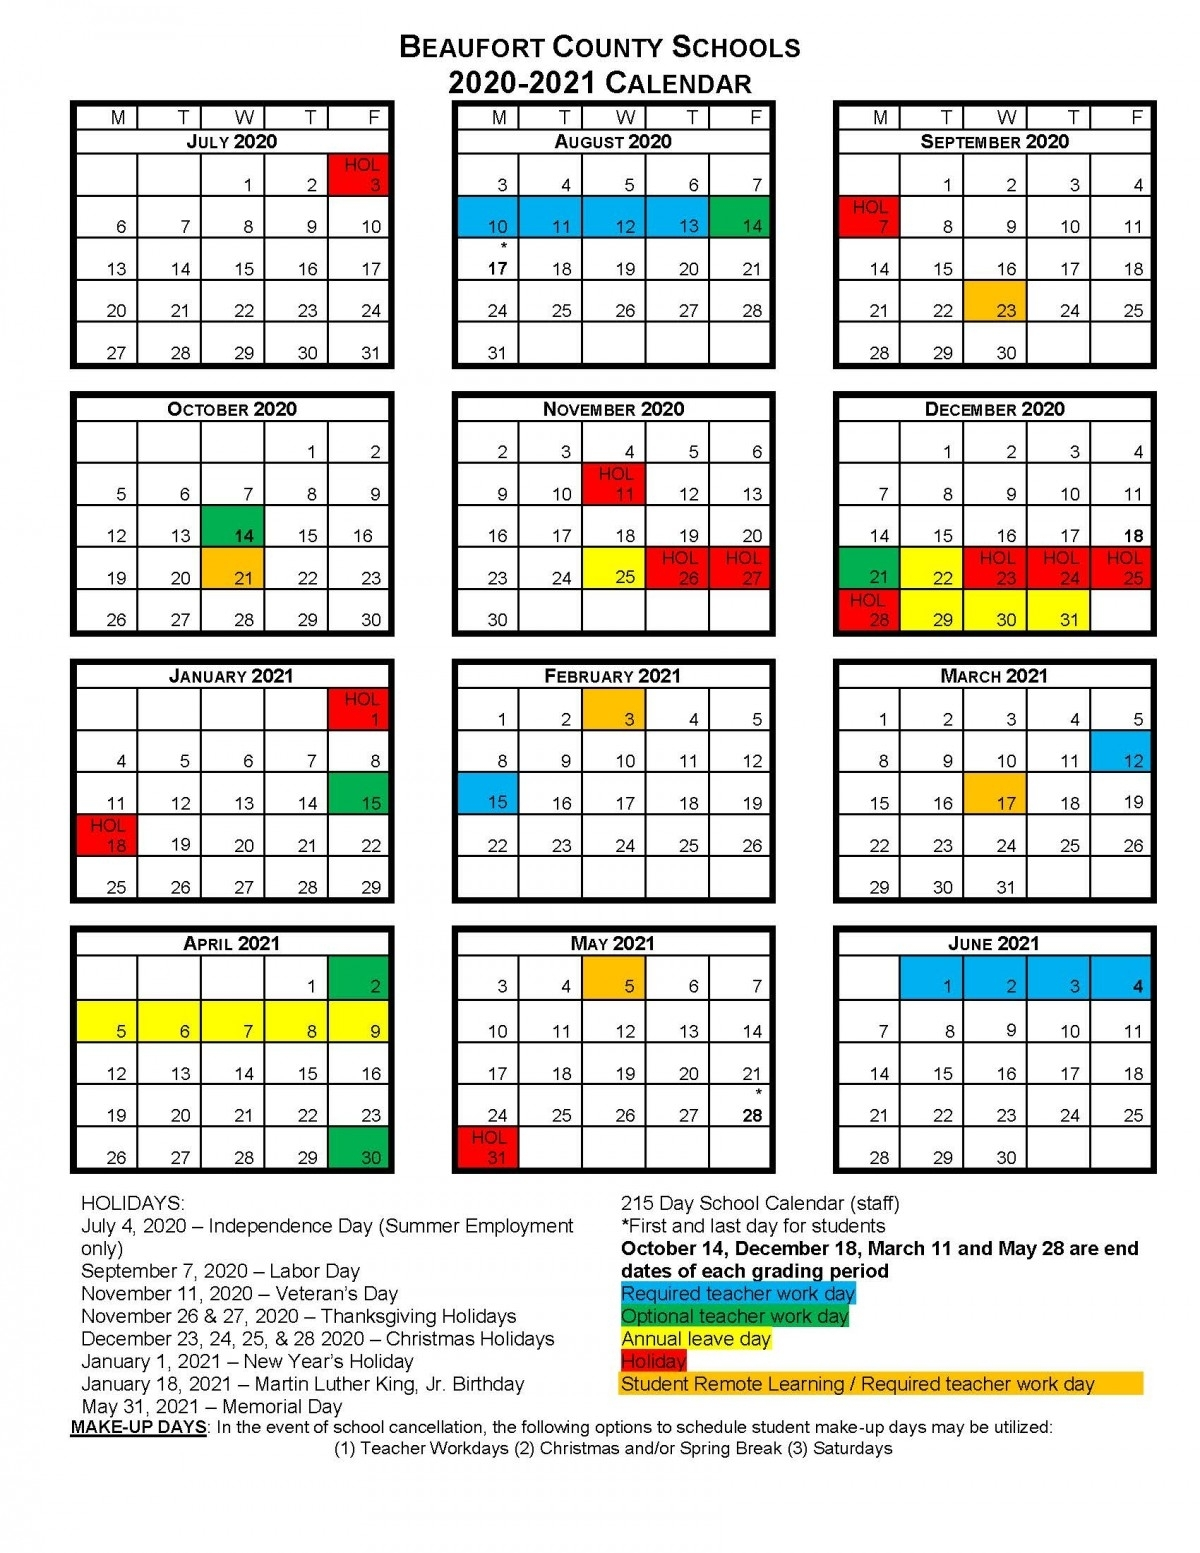 Barrow County School Calendar 2021 22 - Calendar 2021